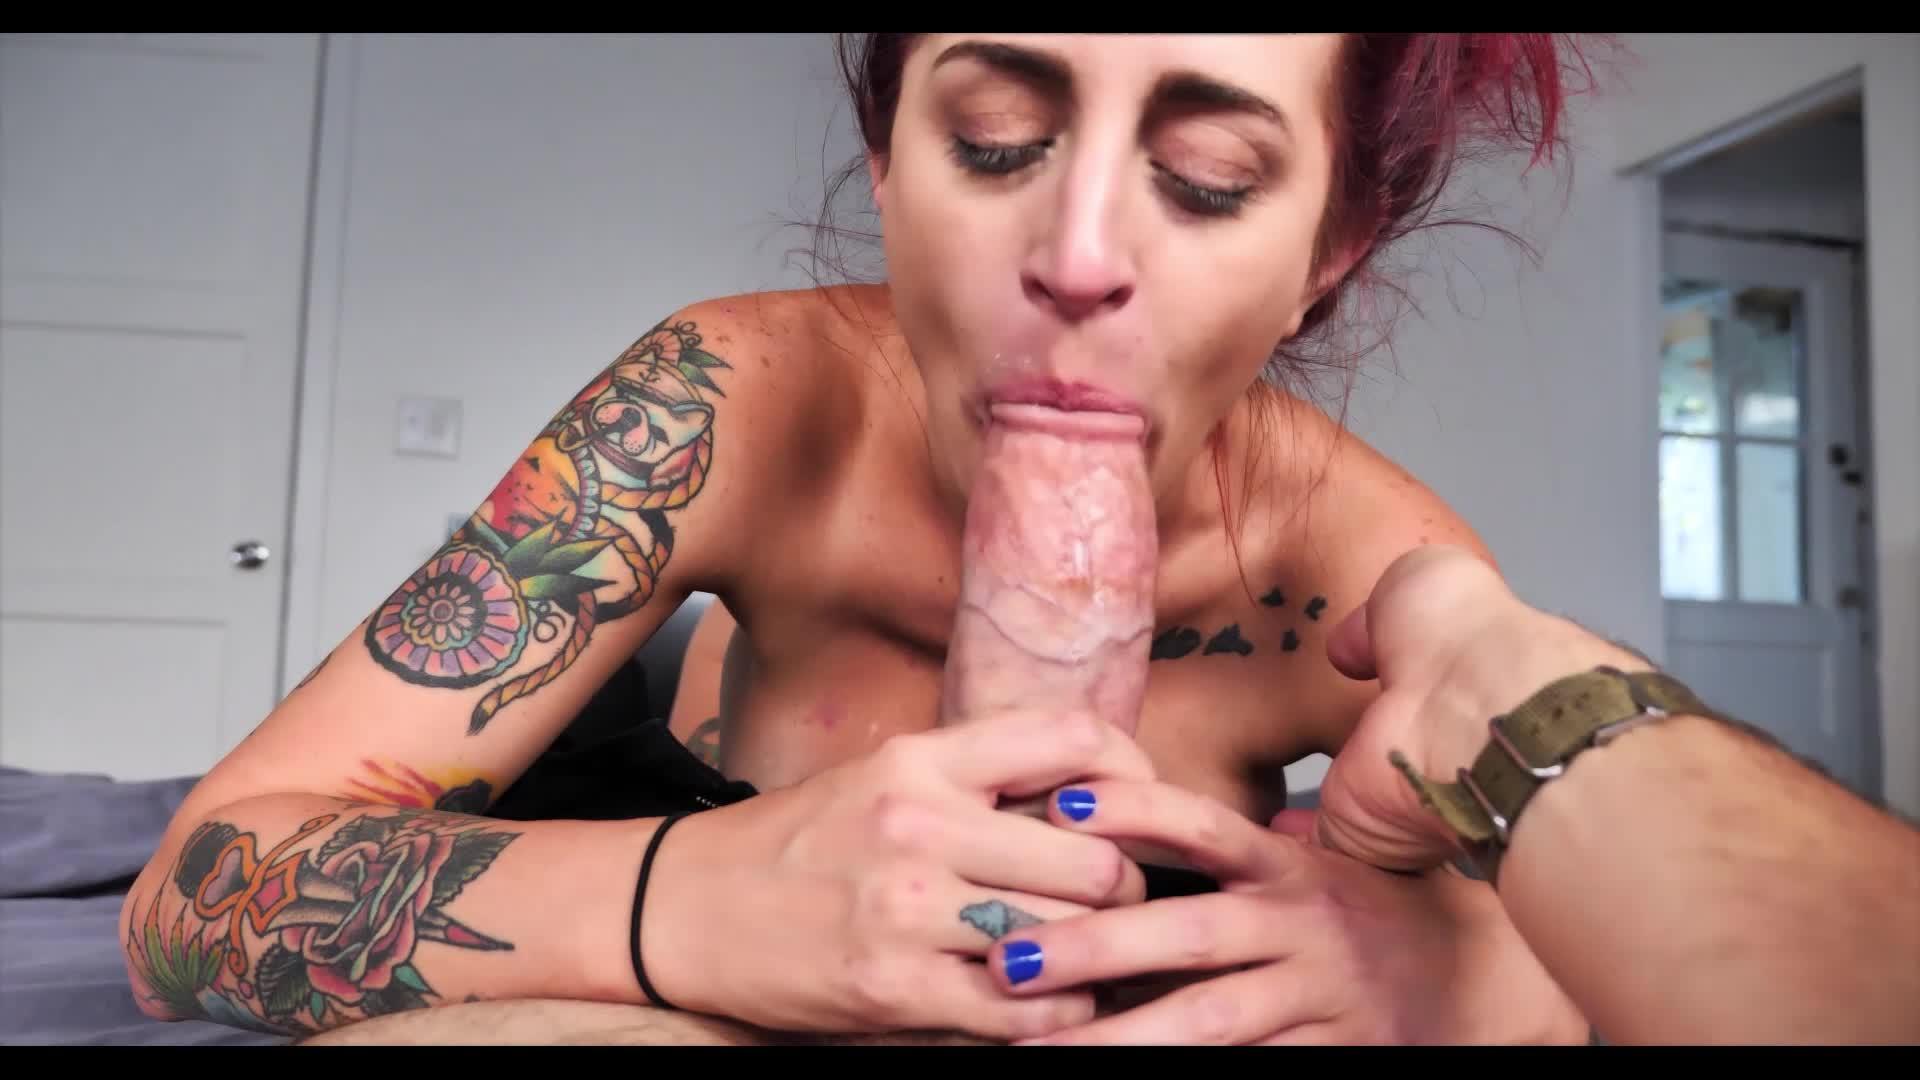 Sally Mustang Fappening,Niykee heaton thong Erotic image Elisa meliani nude,Brittani Bader Nude Hot Photo Collection - 7 Photos